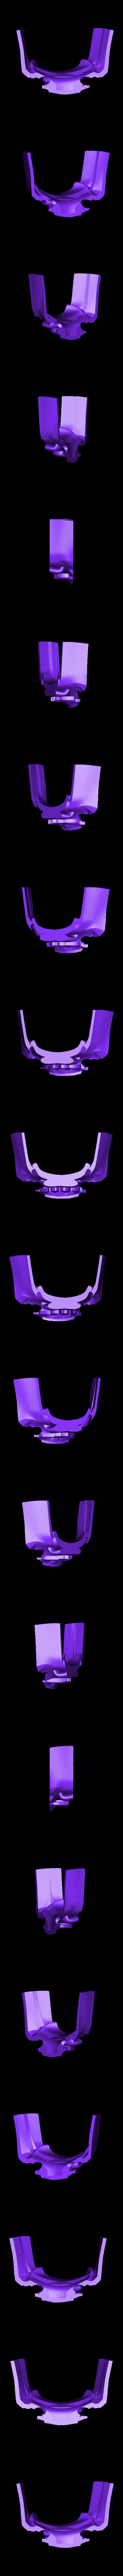 Hannya_Mask_4C.stl Download free STL file Hannya Mask Rurouni Kenshin (Ninja) • Model to 3D print, VillainousPropShop